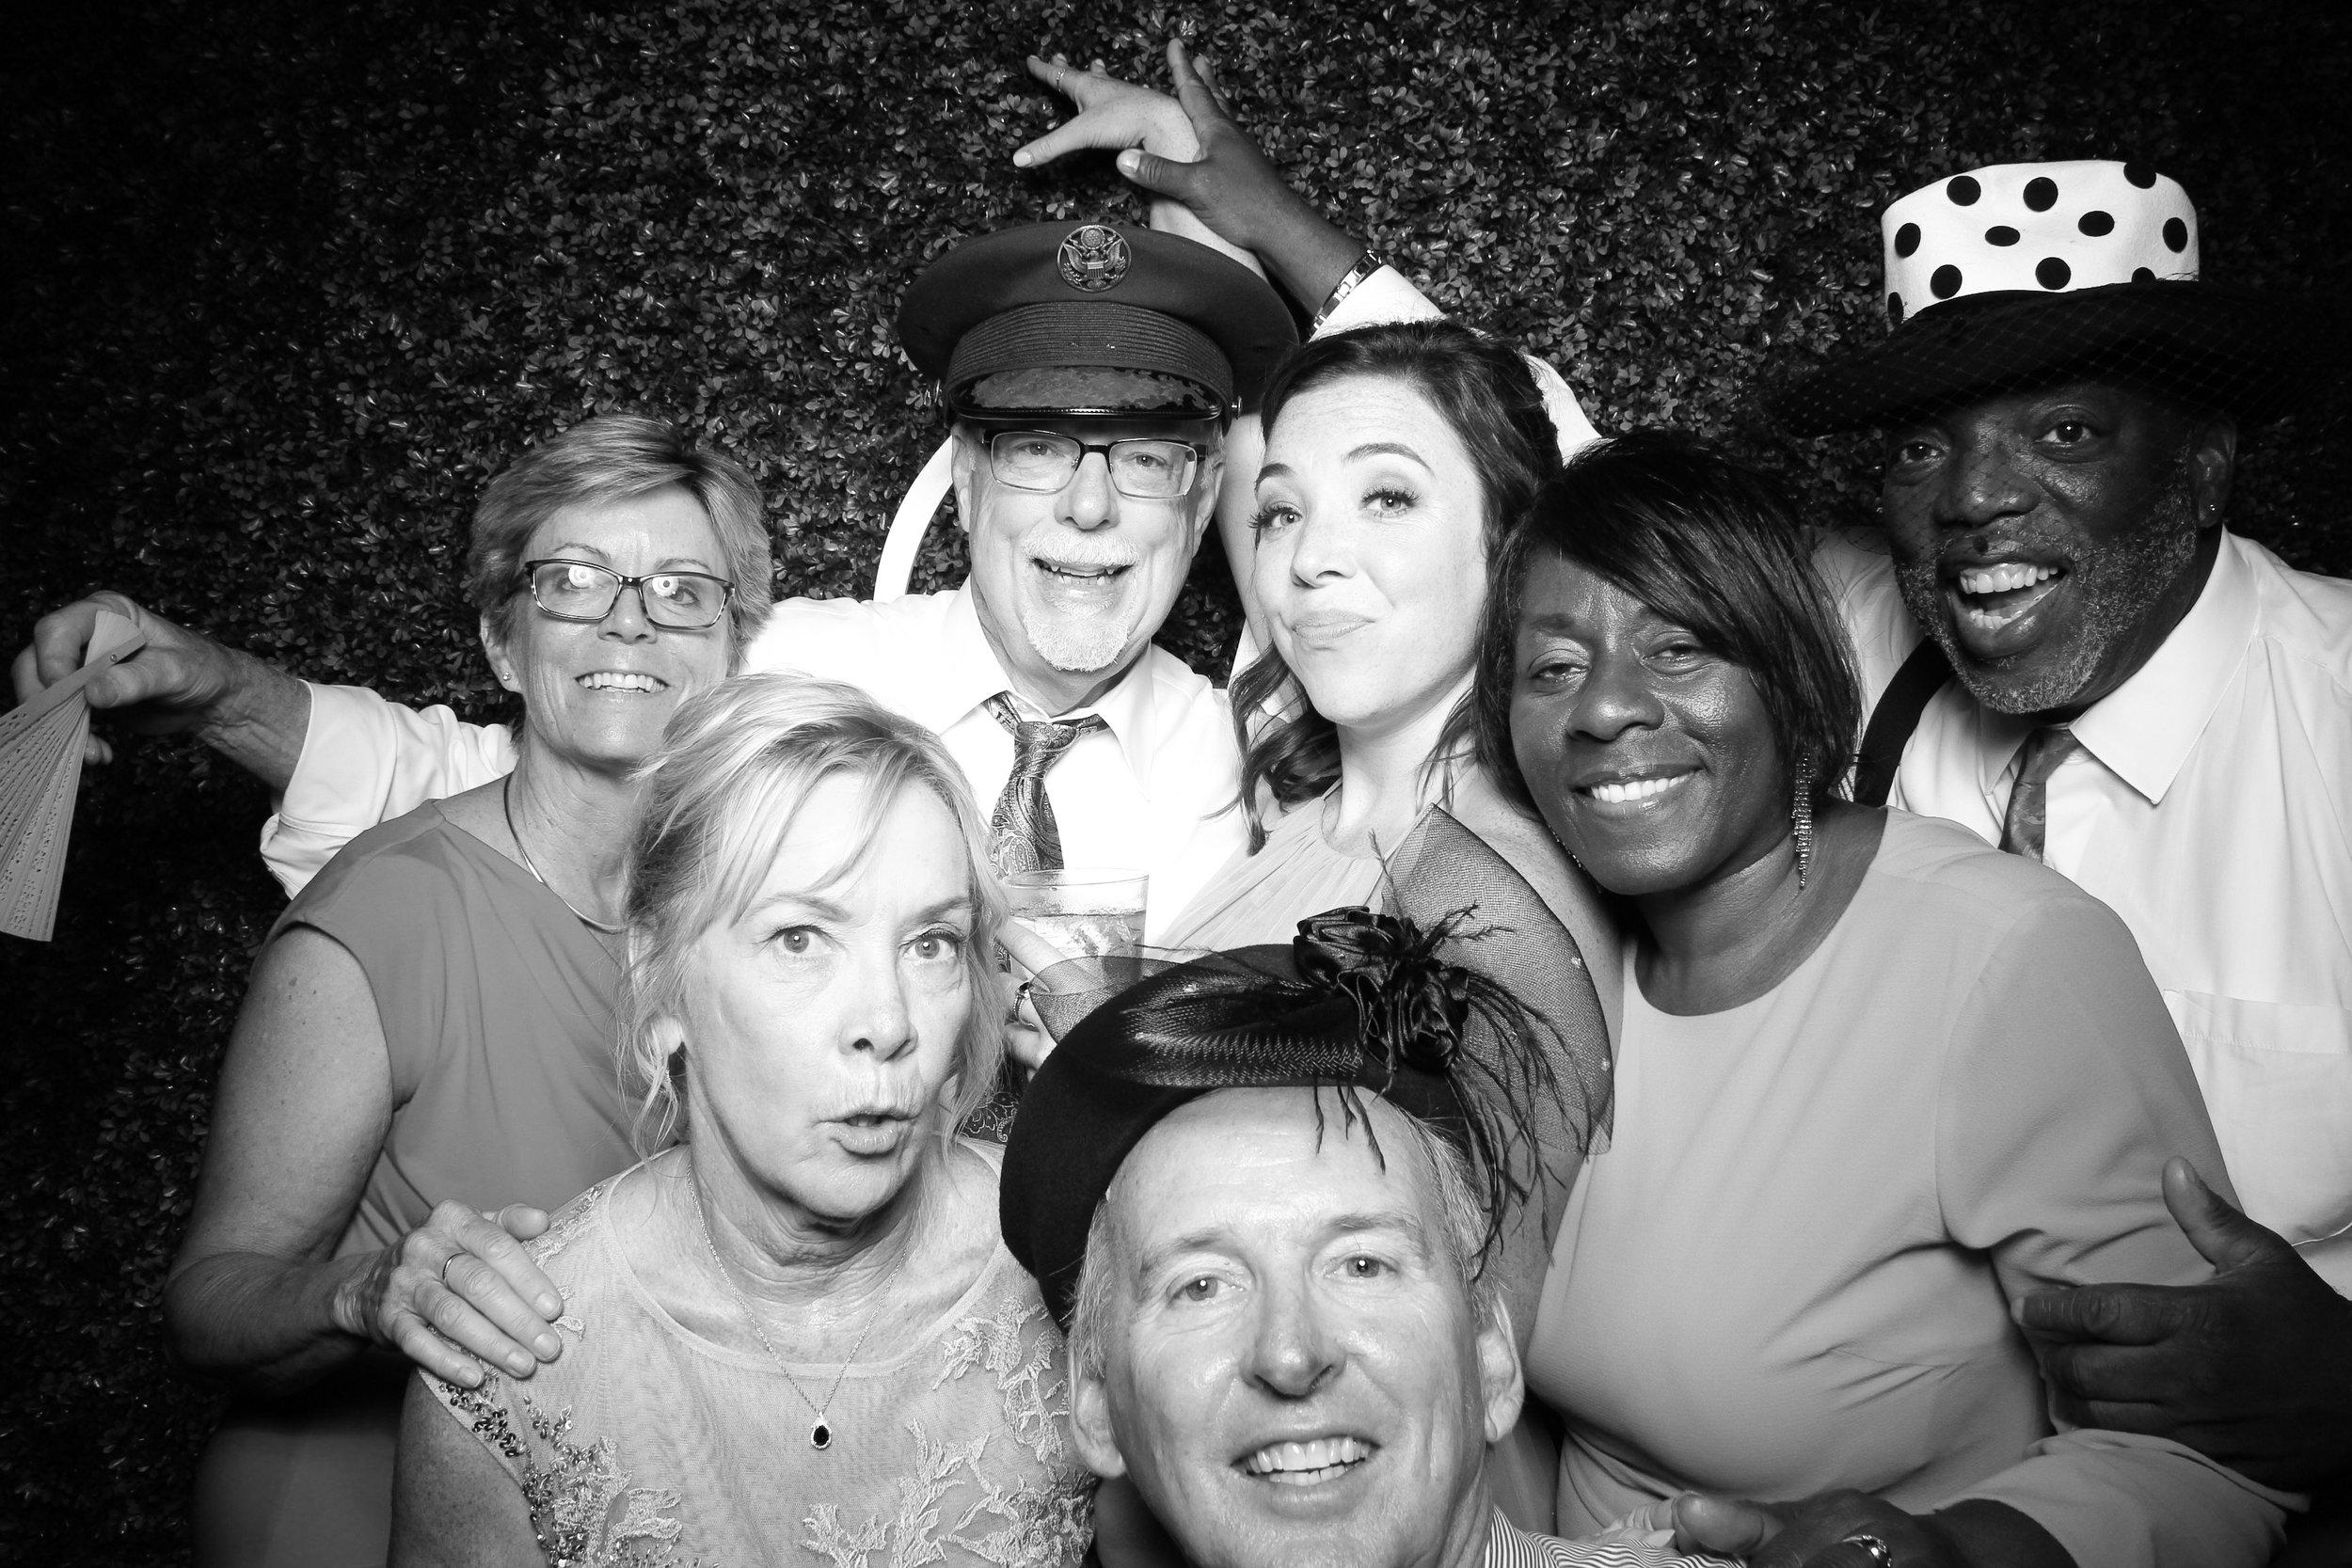 Ignite_Glass_Studio_Wedding_Photo_Booth_Boxwood_Chicago_09.jpg